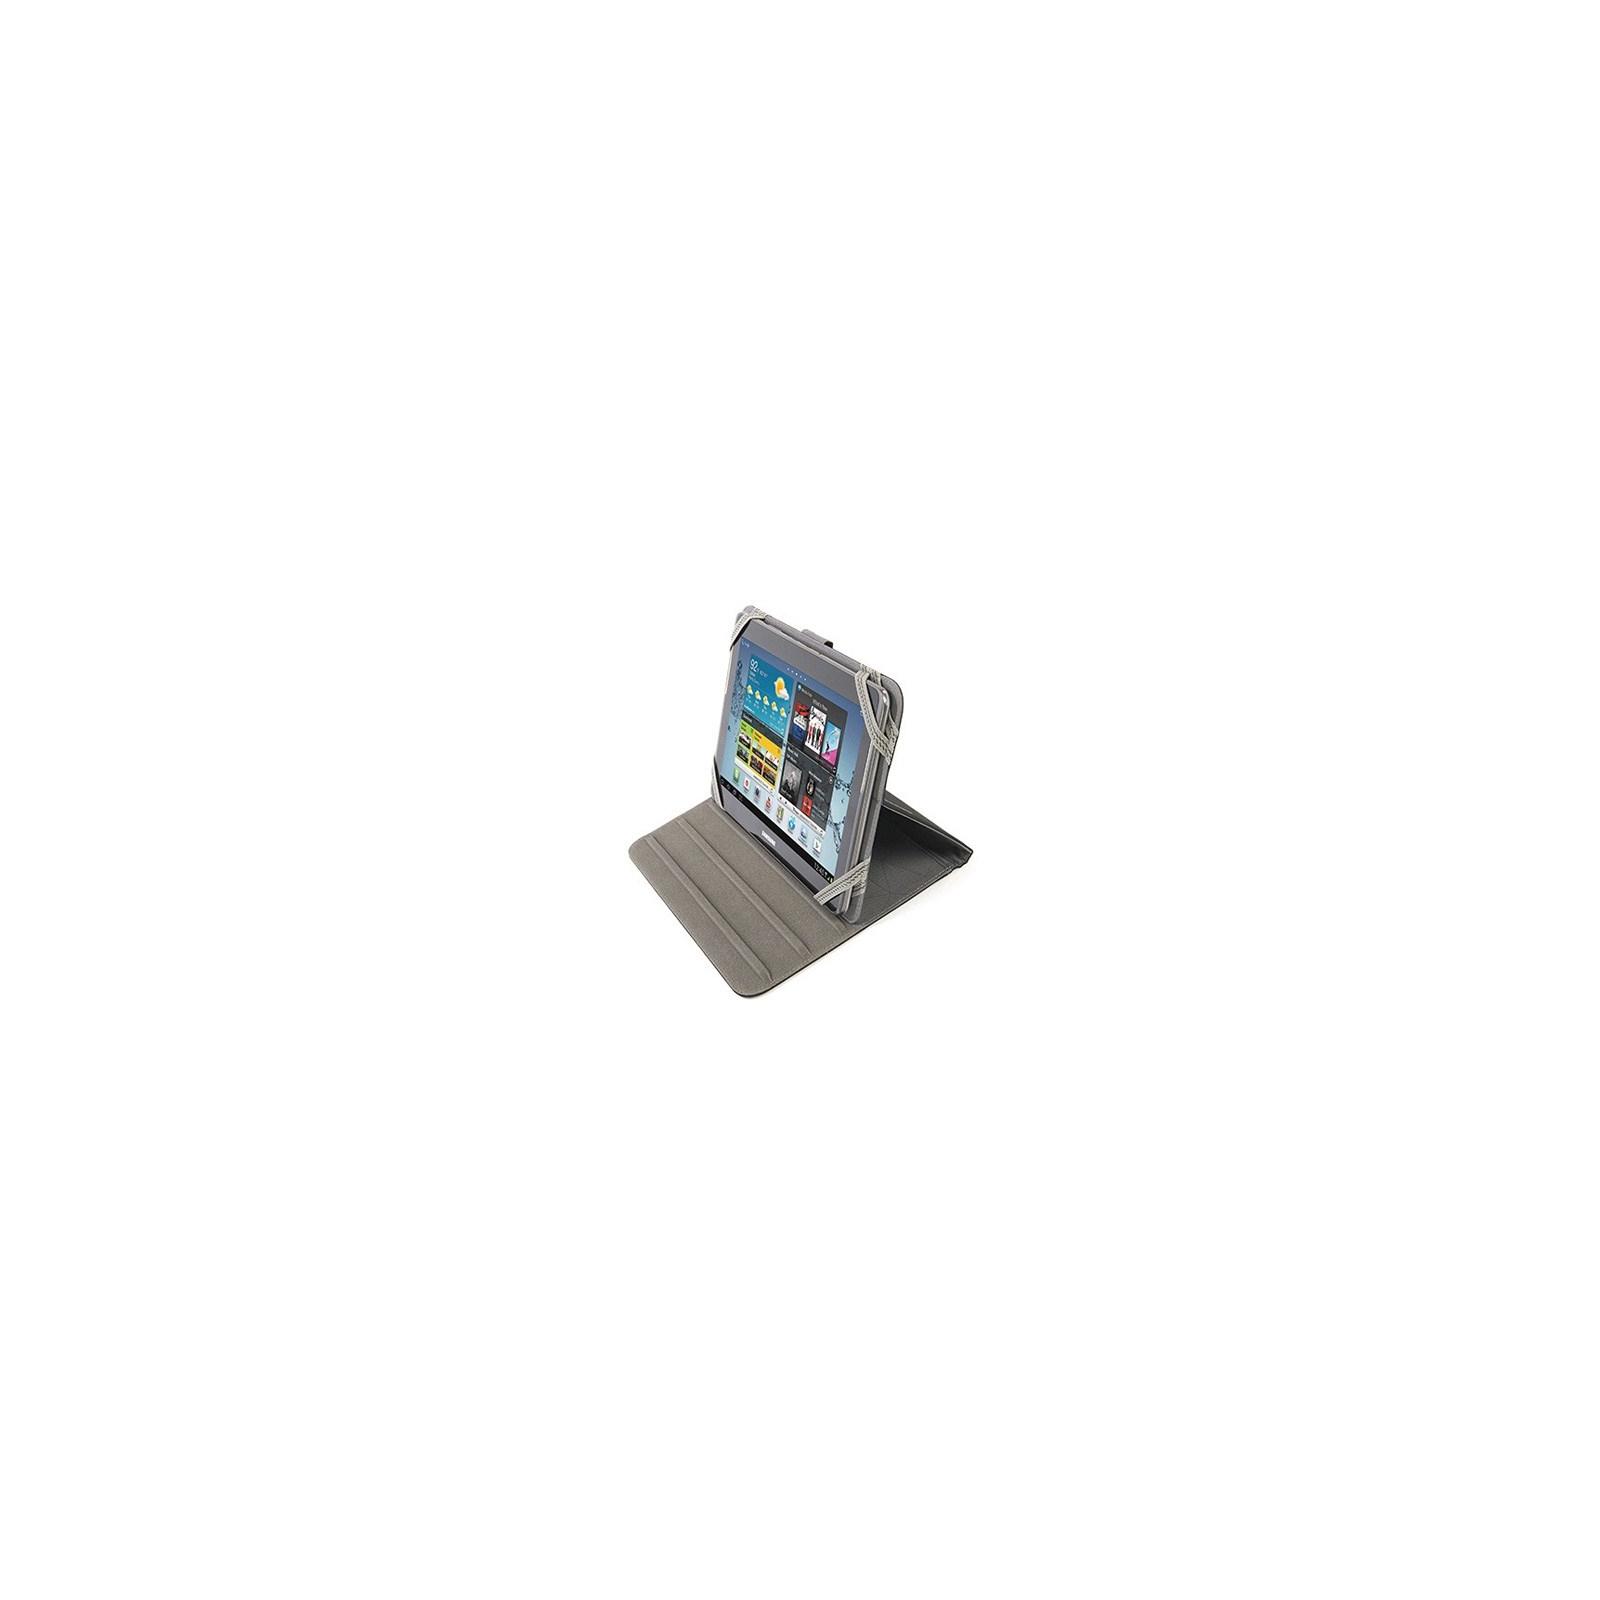 "Чехол для планшета Tucano 10"" Facile Stand Black (TAB-FA10) изображение 3"